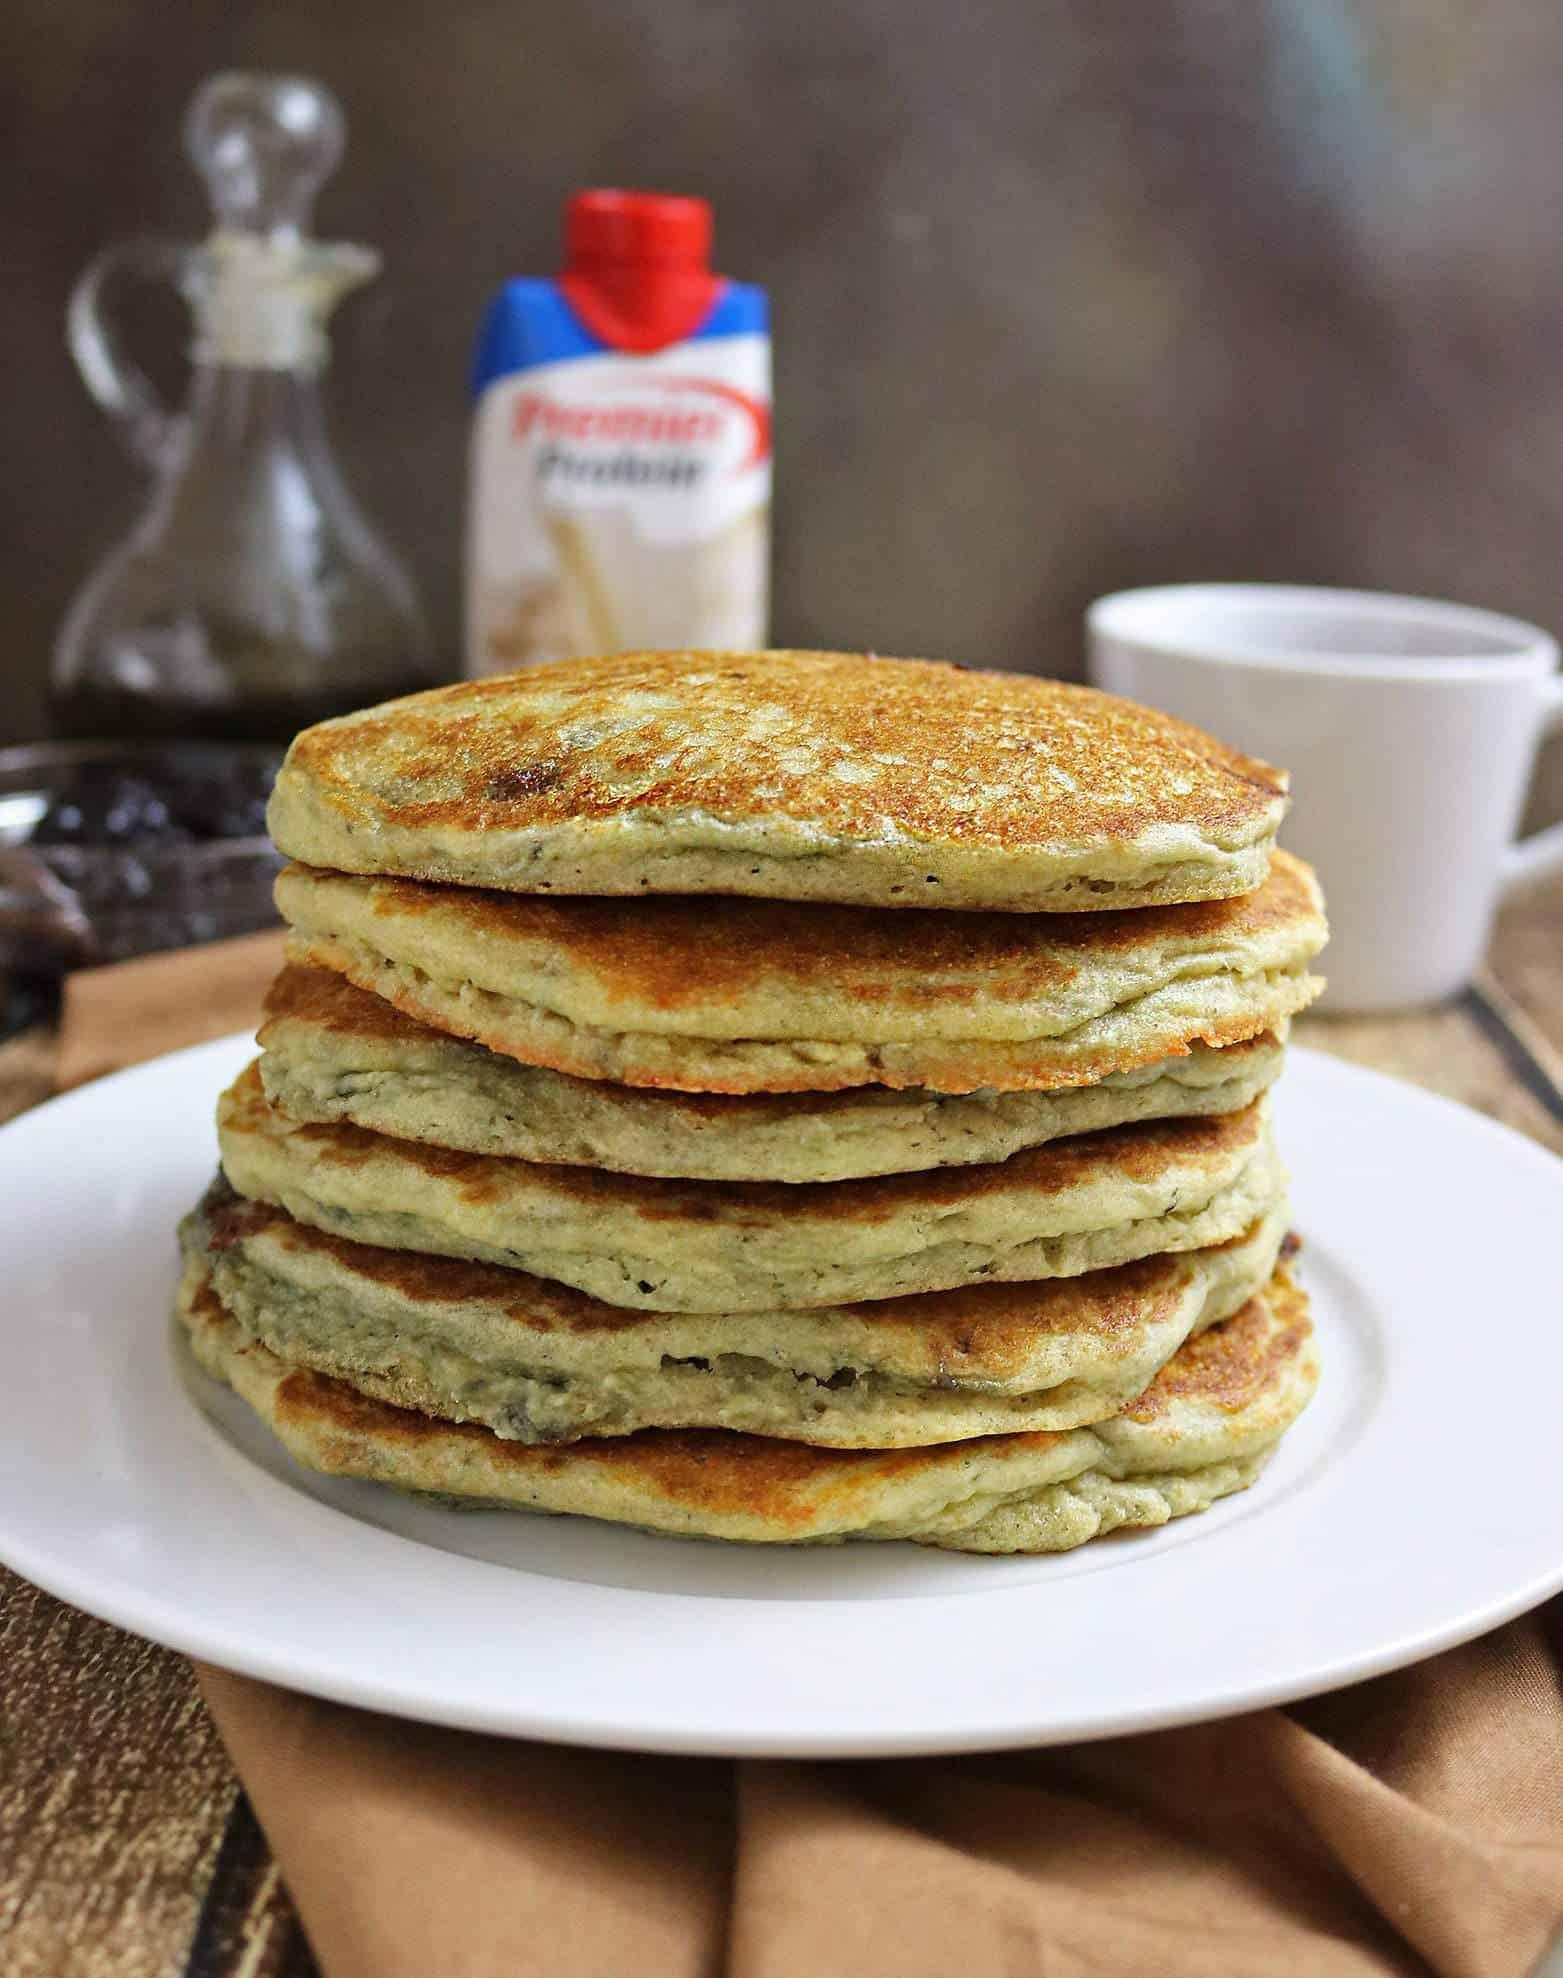 Marionberry Protein Pancakes